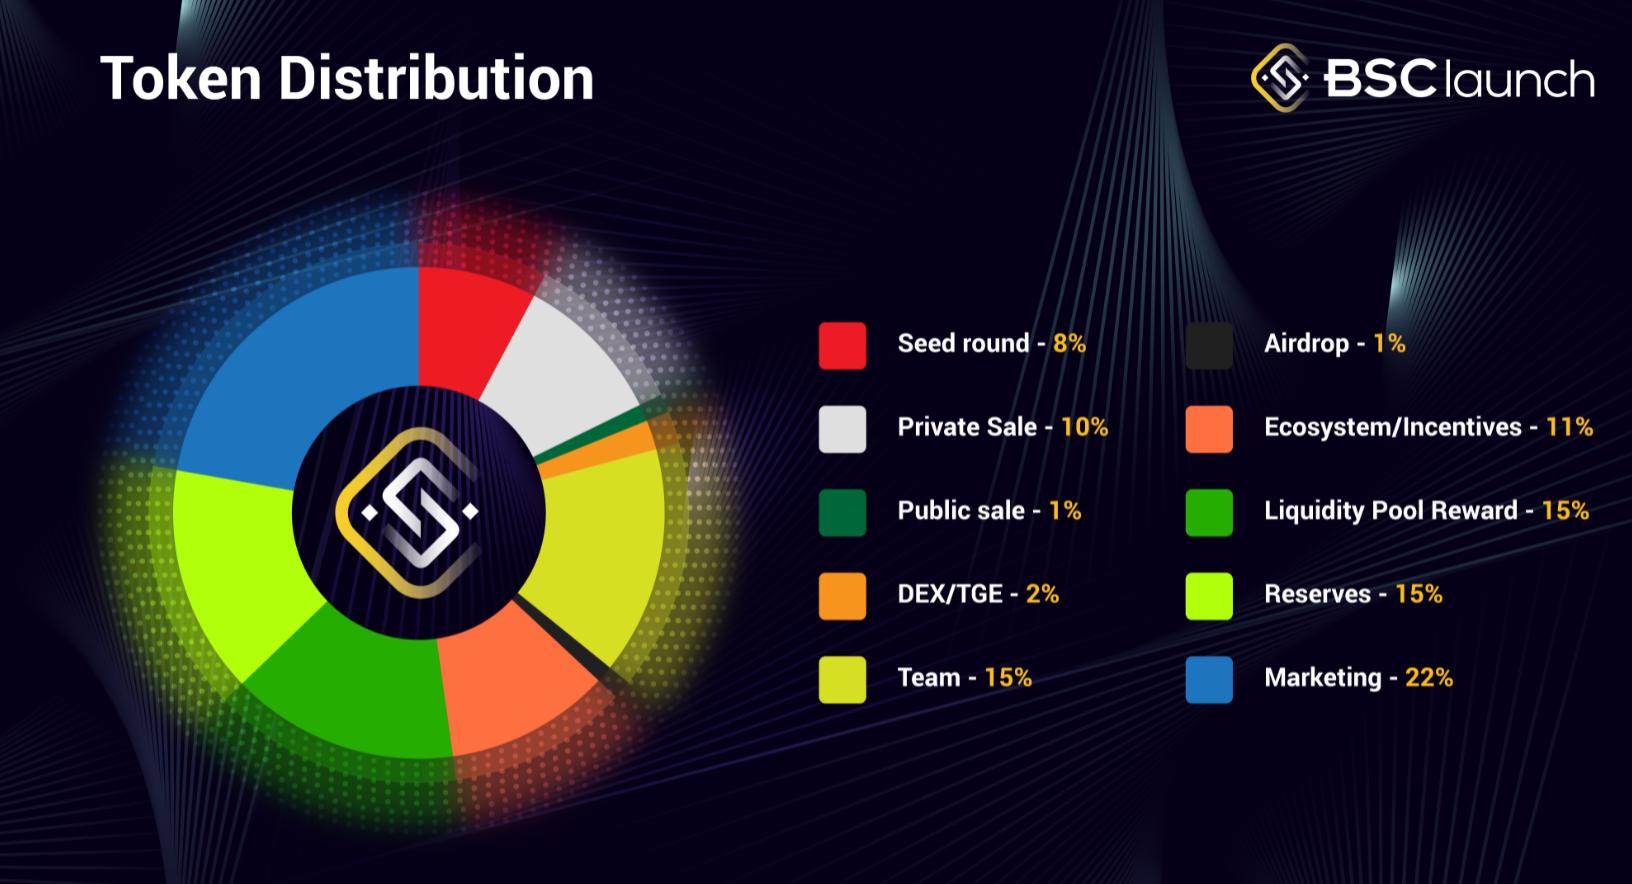 bsclaunch token allocation